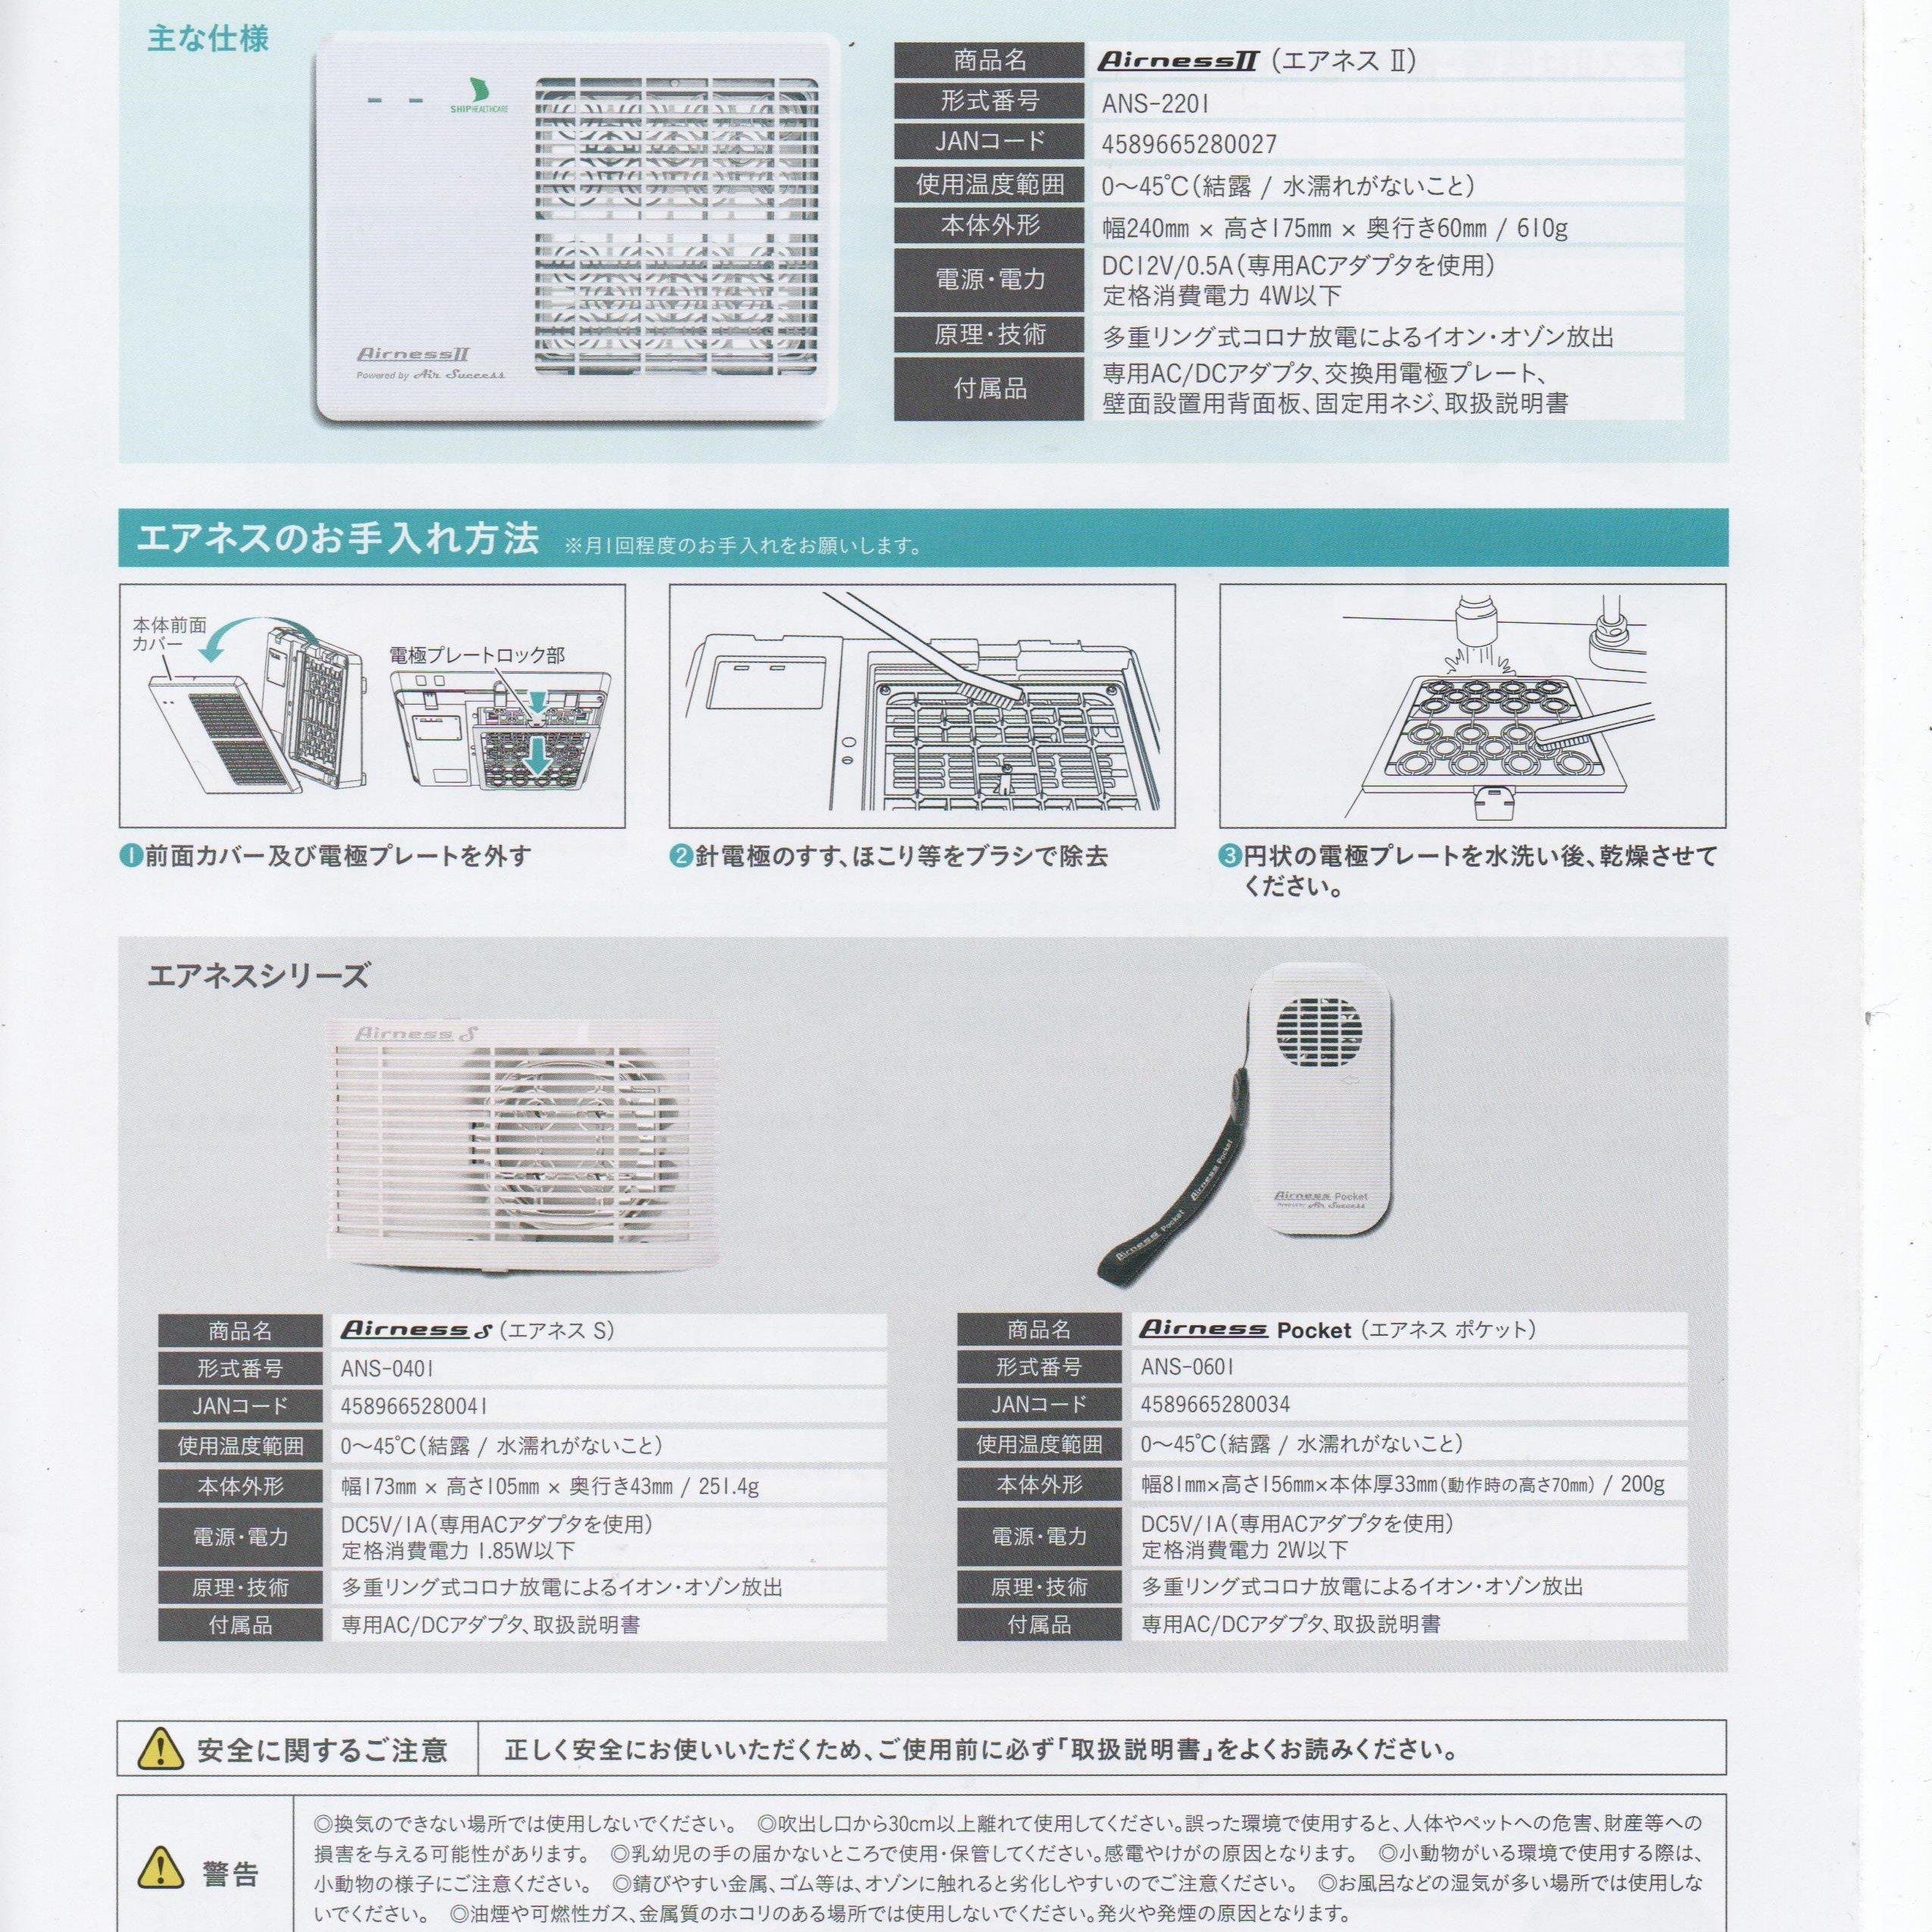 AirnessⅡ低濃度オゾン発生装置         (現地払い専用)のイメージその3